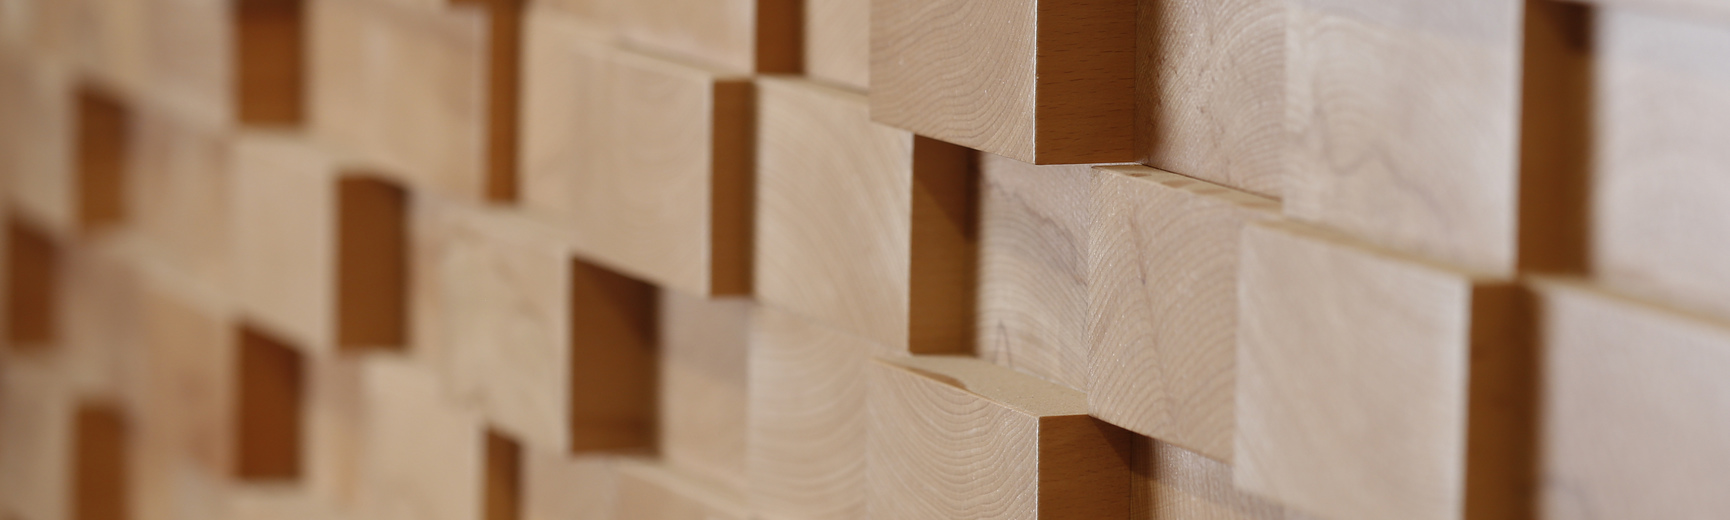 Wooden blocks on wall